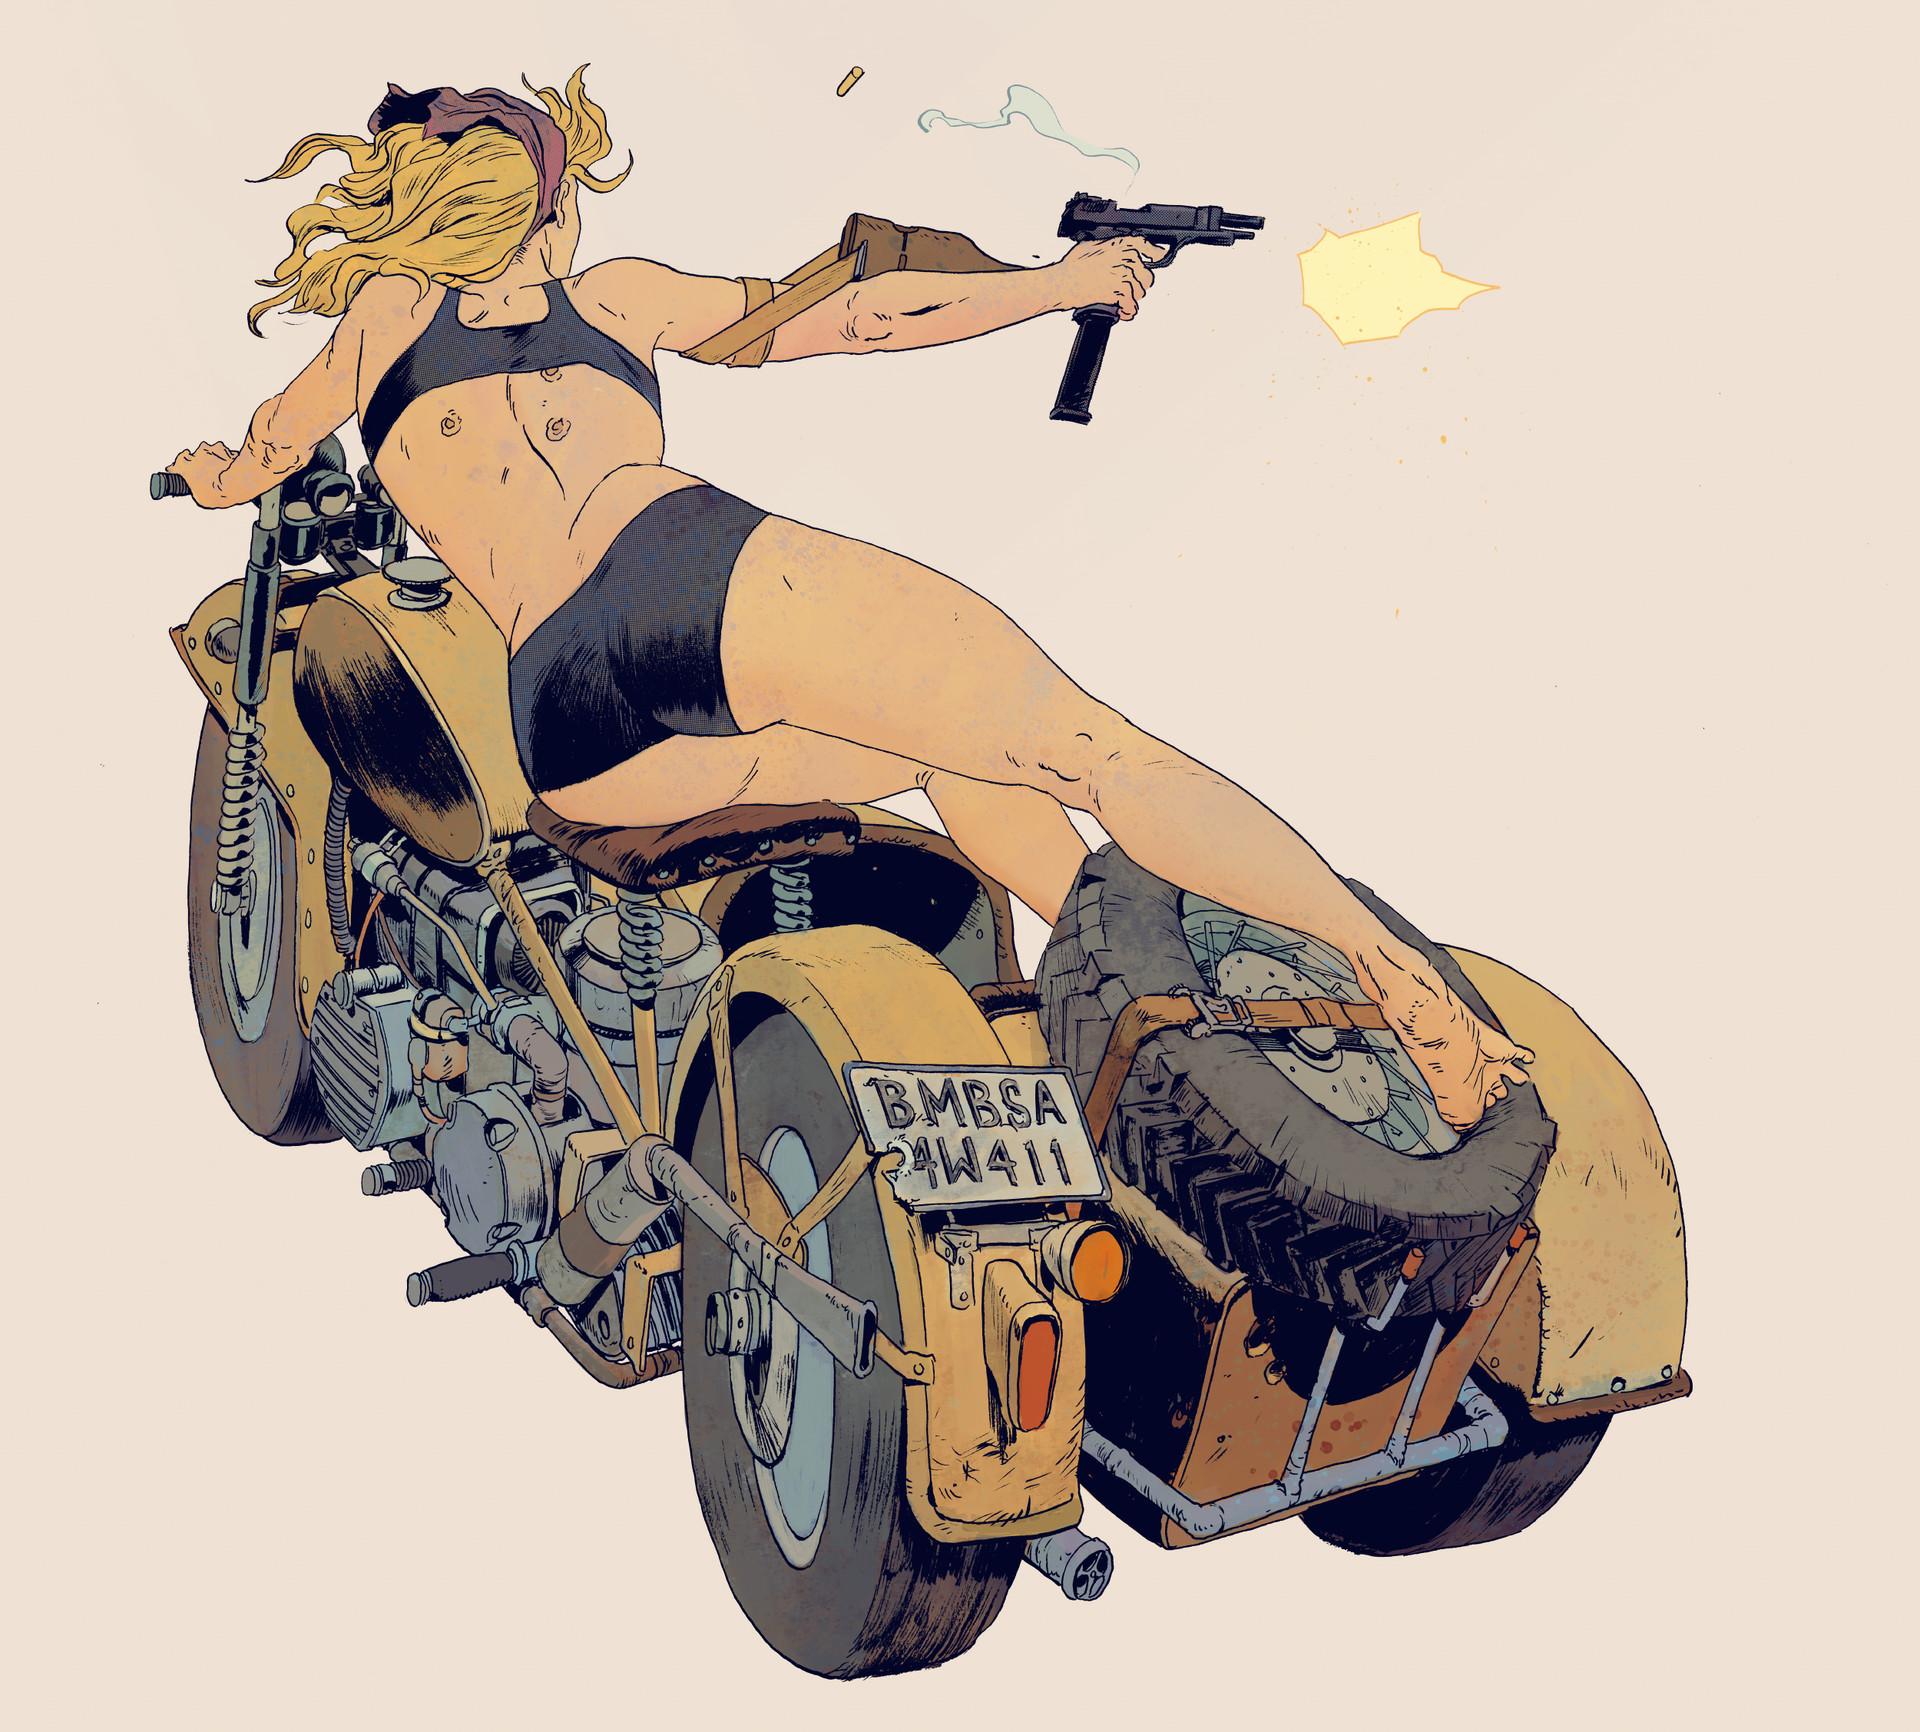 robert-sammelin-ekbergbiker.jpg